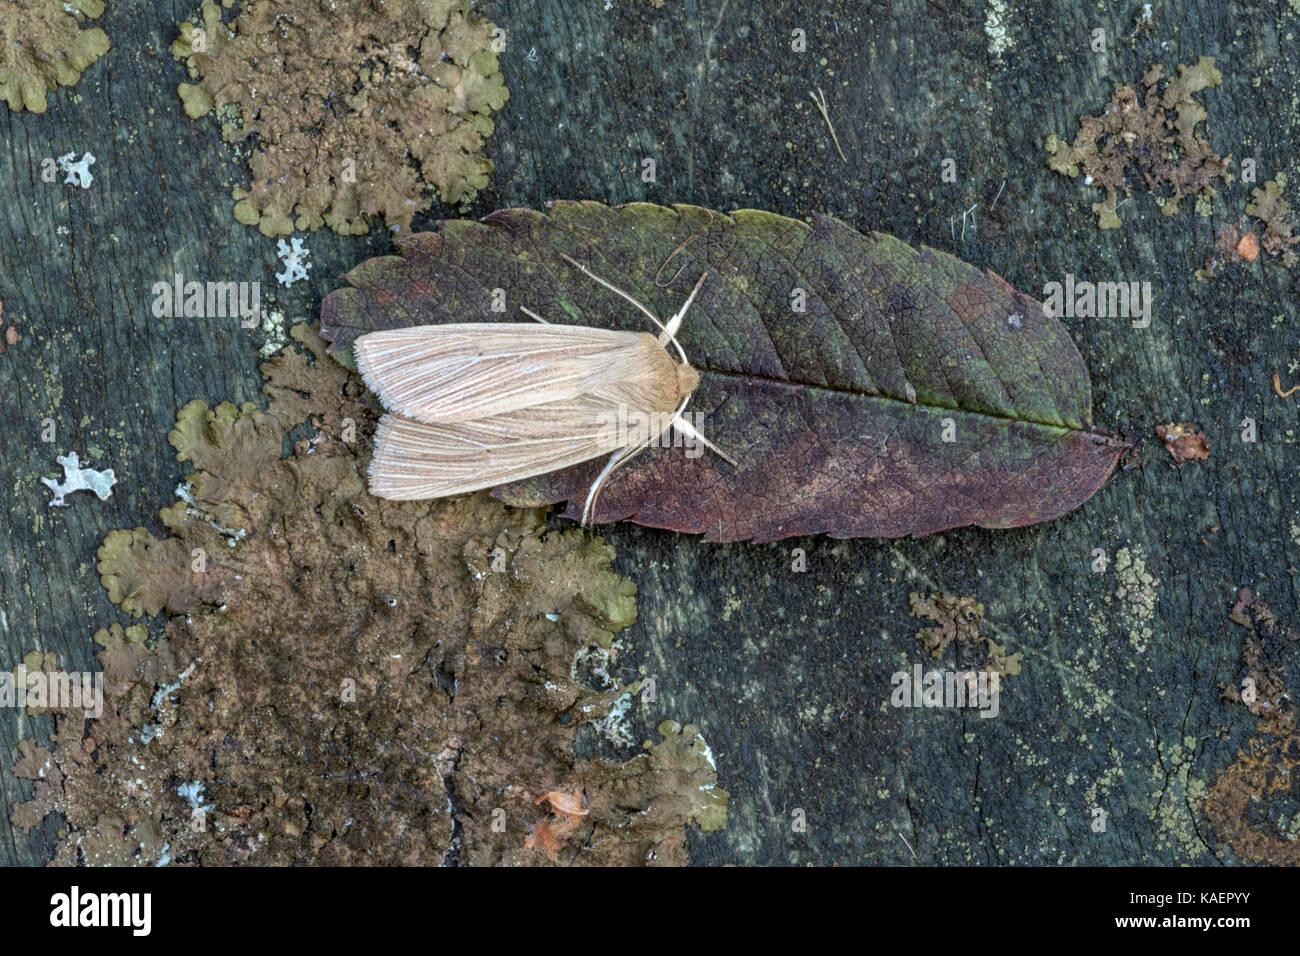 Moth Species resting on a dead leaf in Norfiolk. - Stock Image